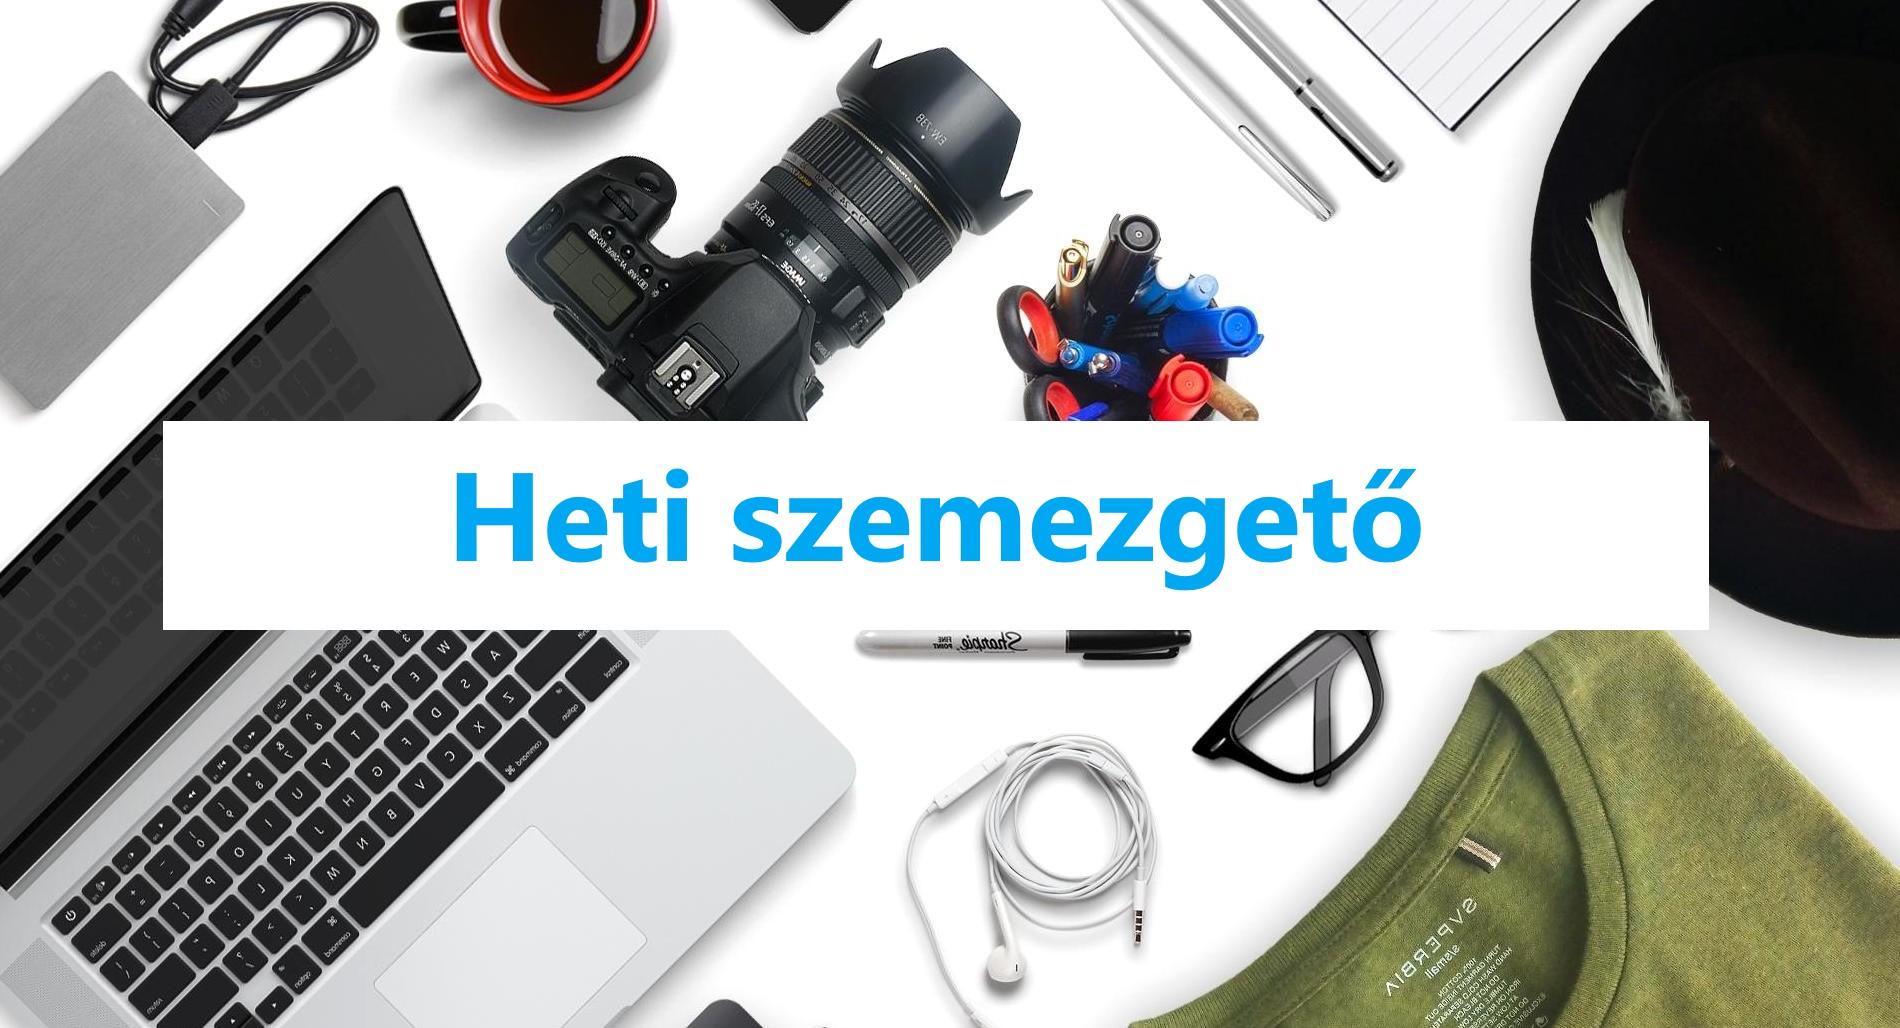 heti_szemezgeto_uj_10.jpg